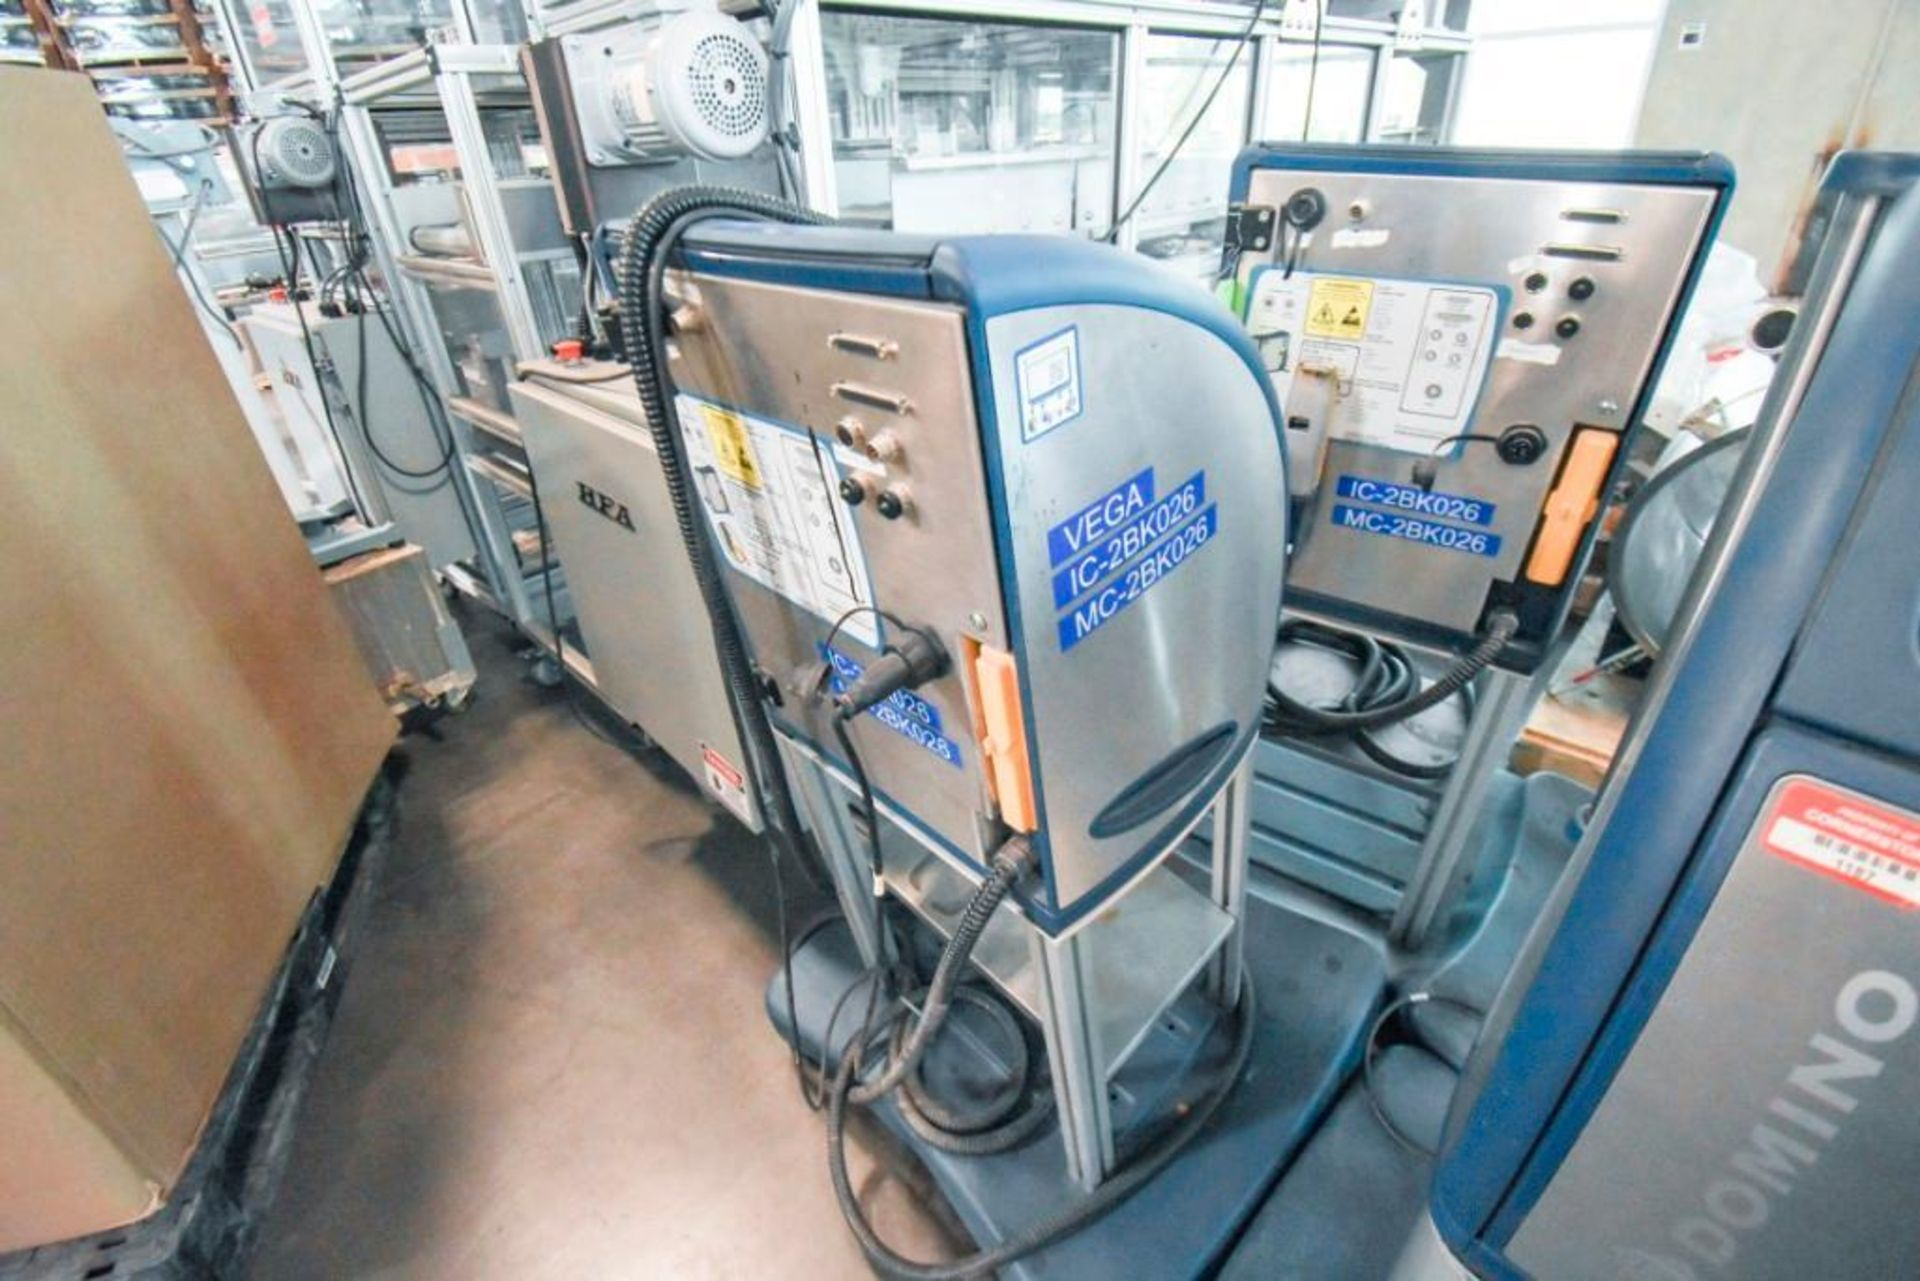 Domino A420i Printers - Image 15 of 21